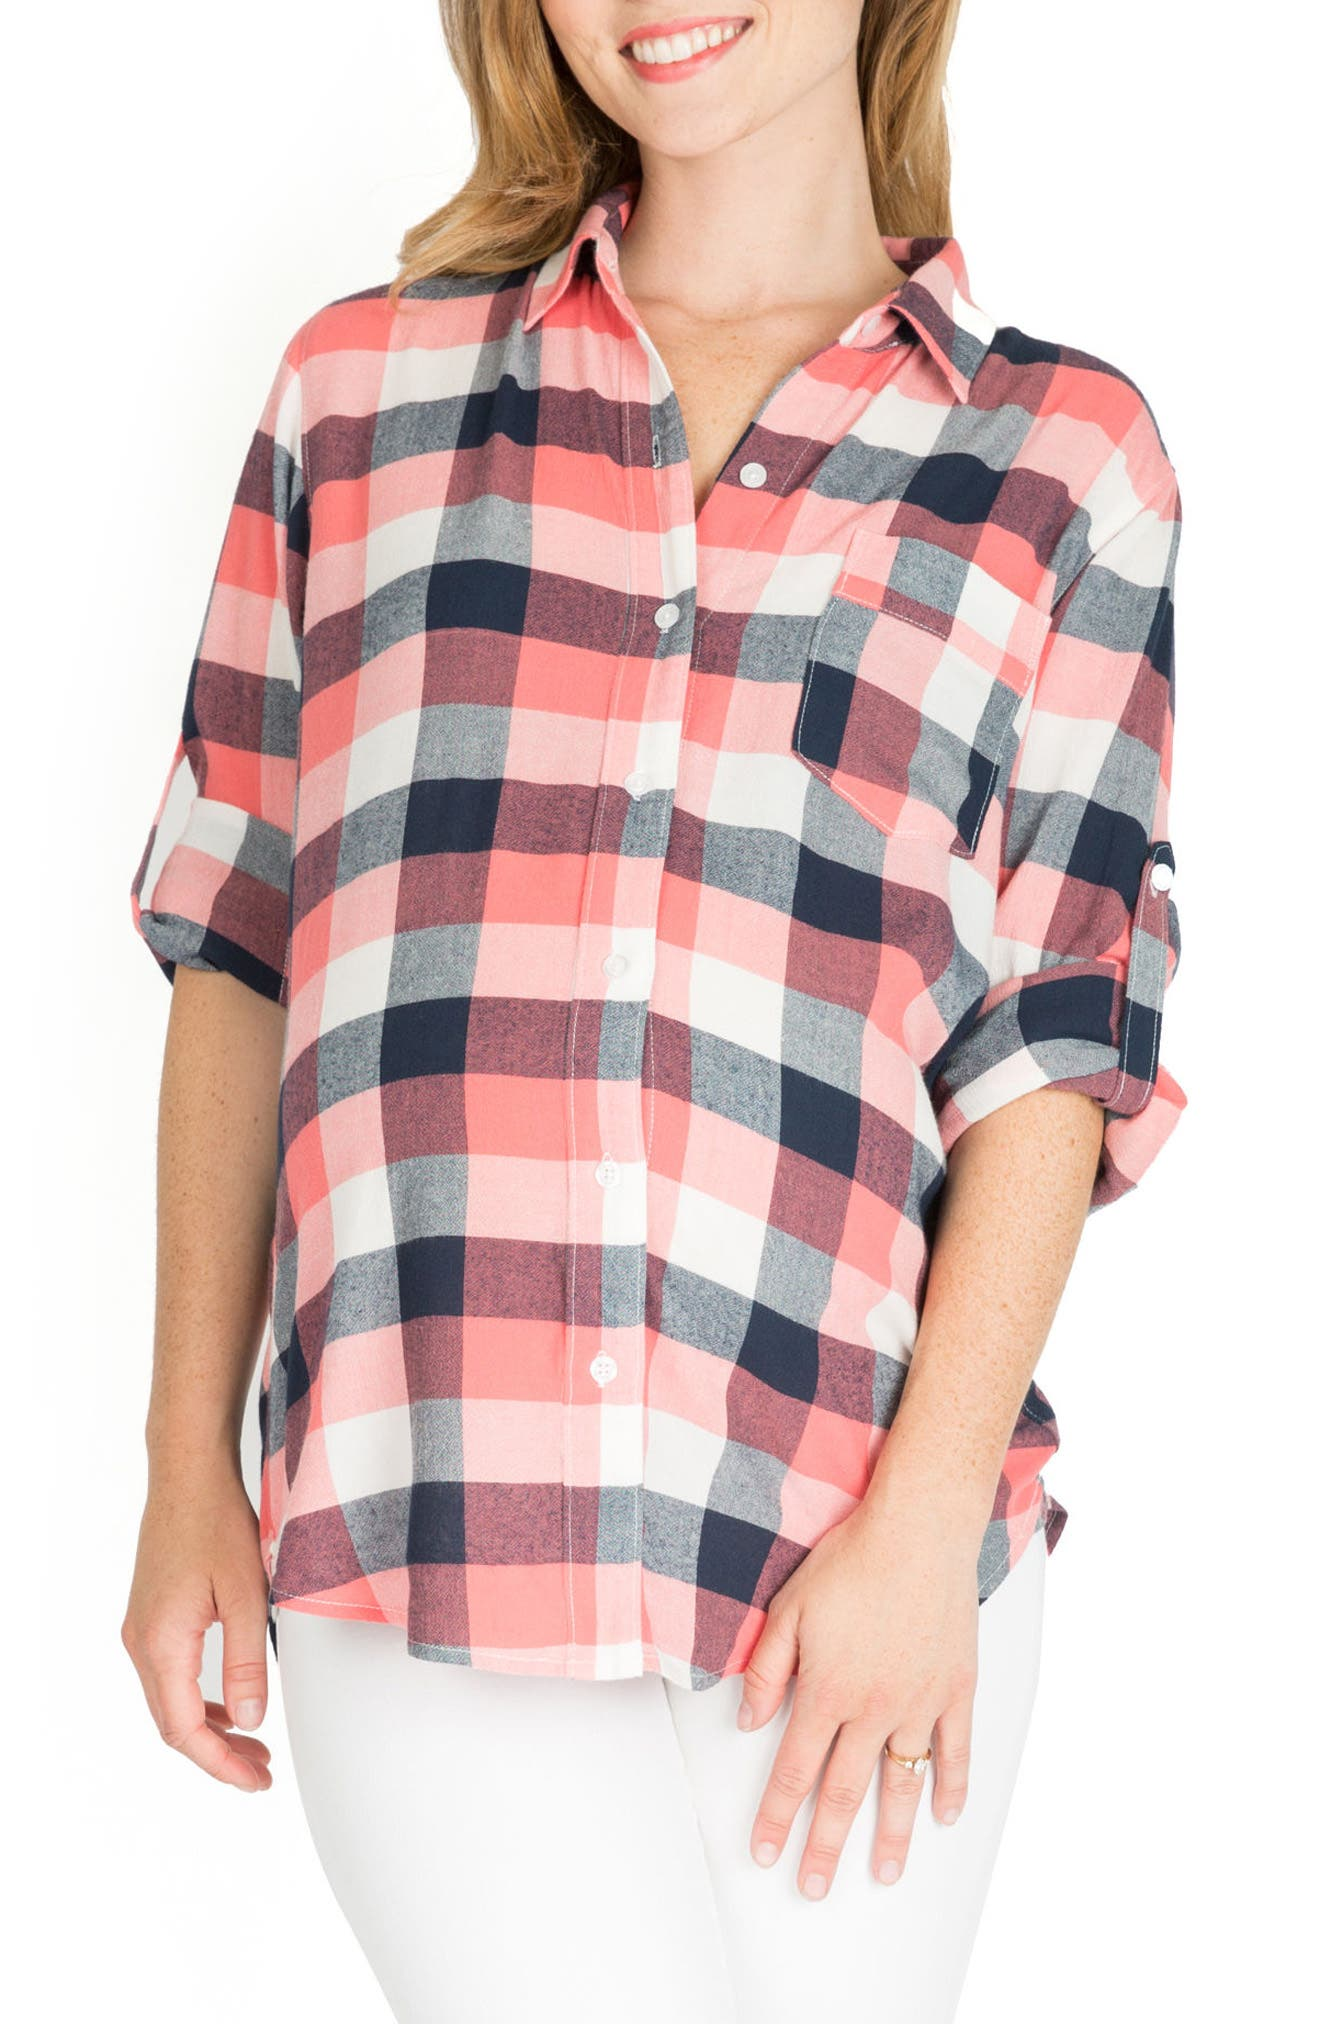 Sadie Maternity/Nursing Shirt,                             Main thumbnail 1, color,                             Pink Plaid